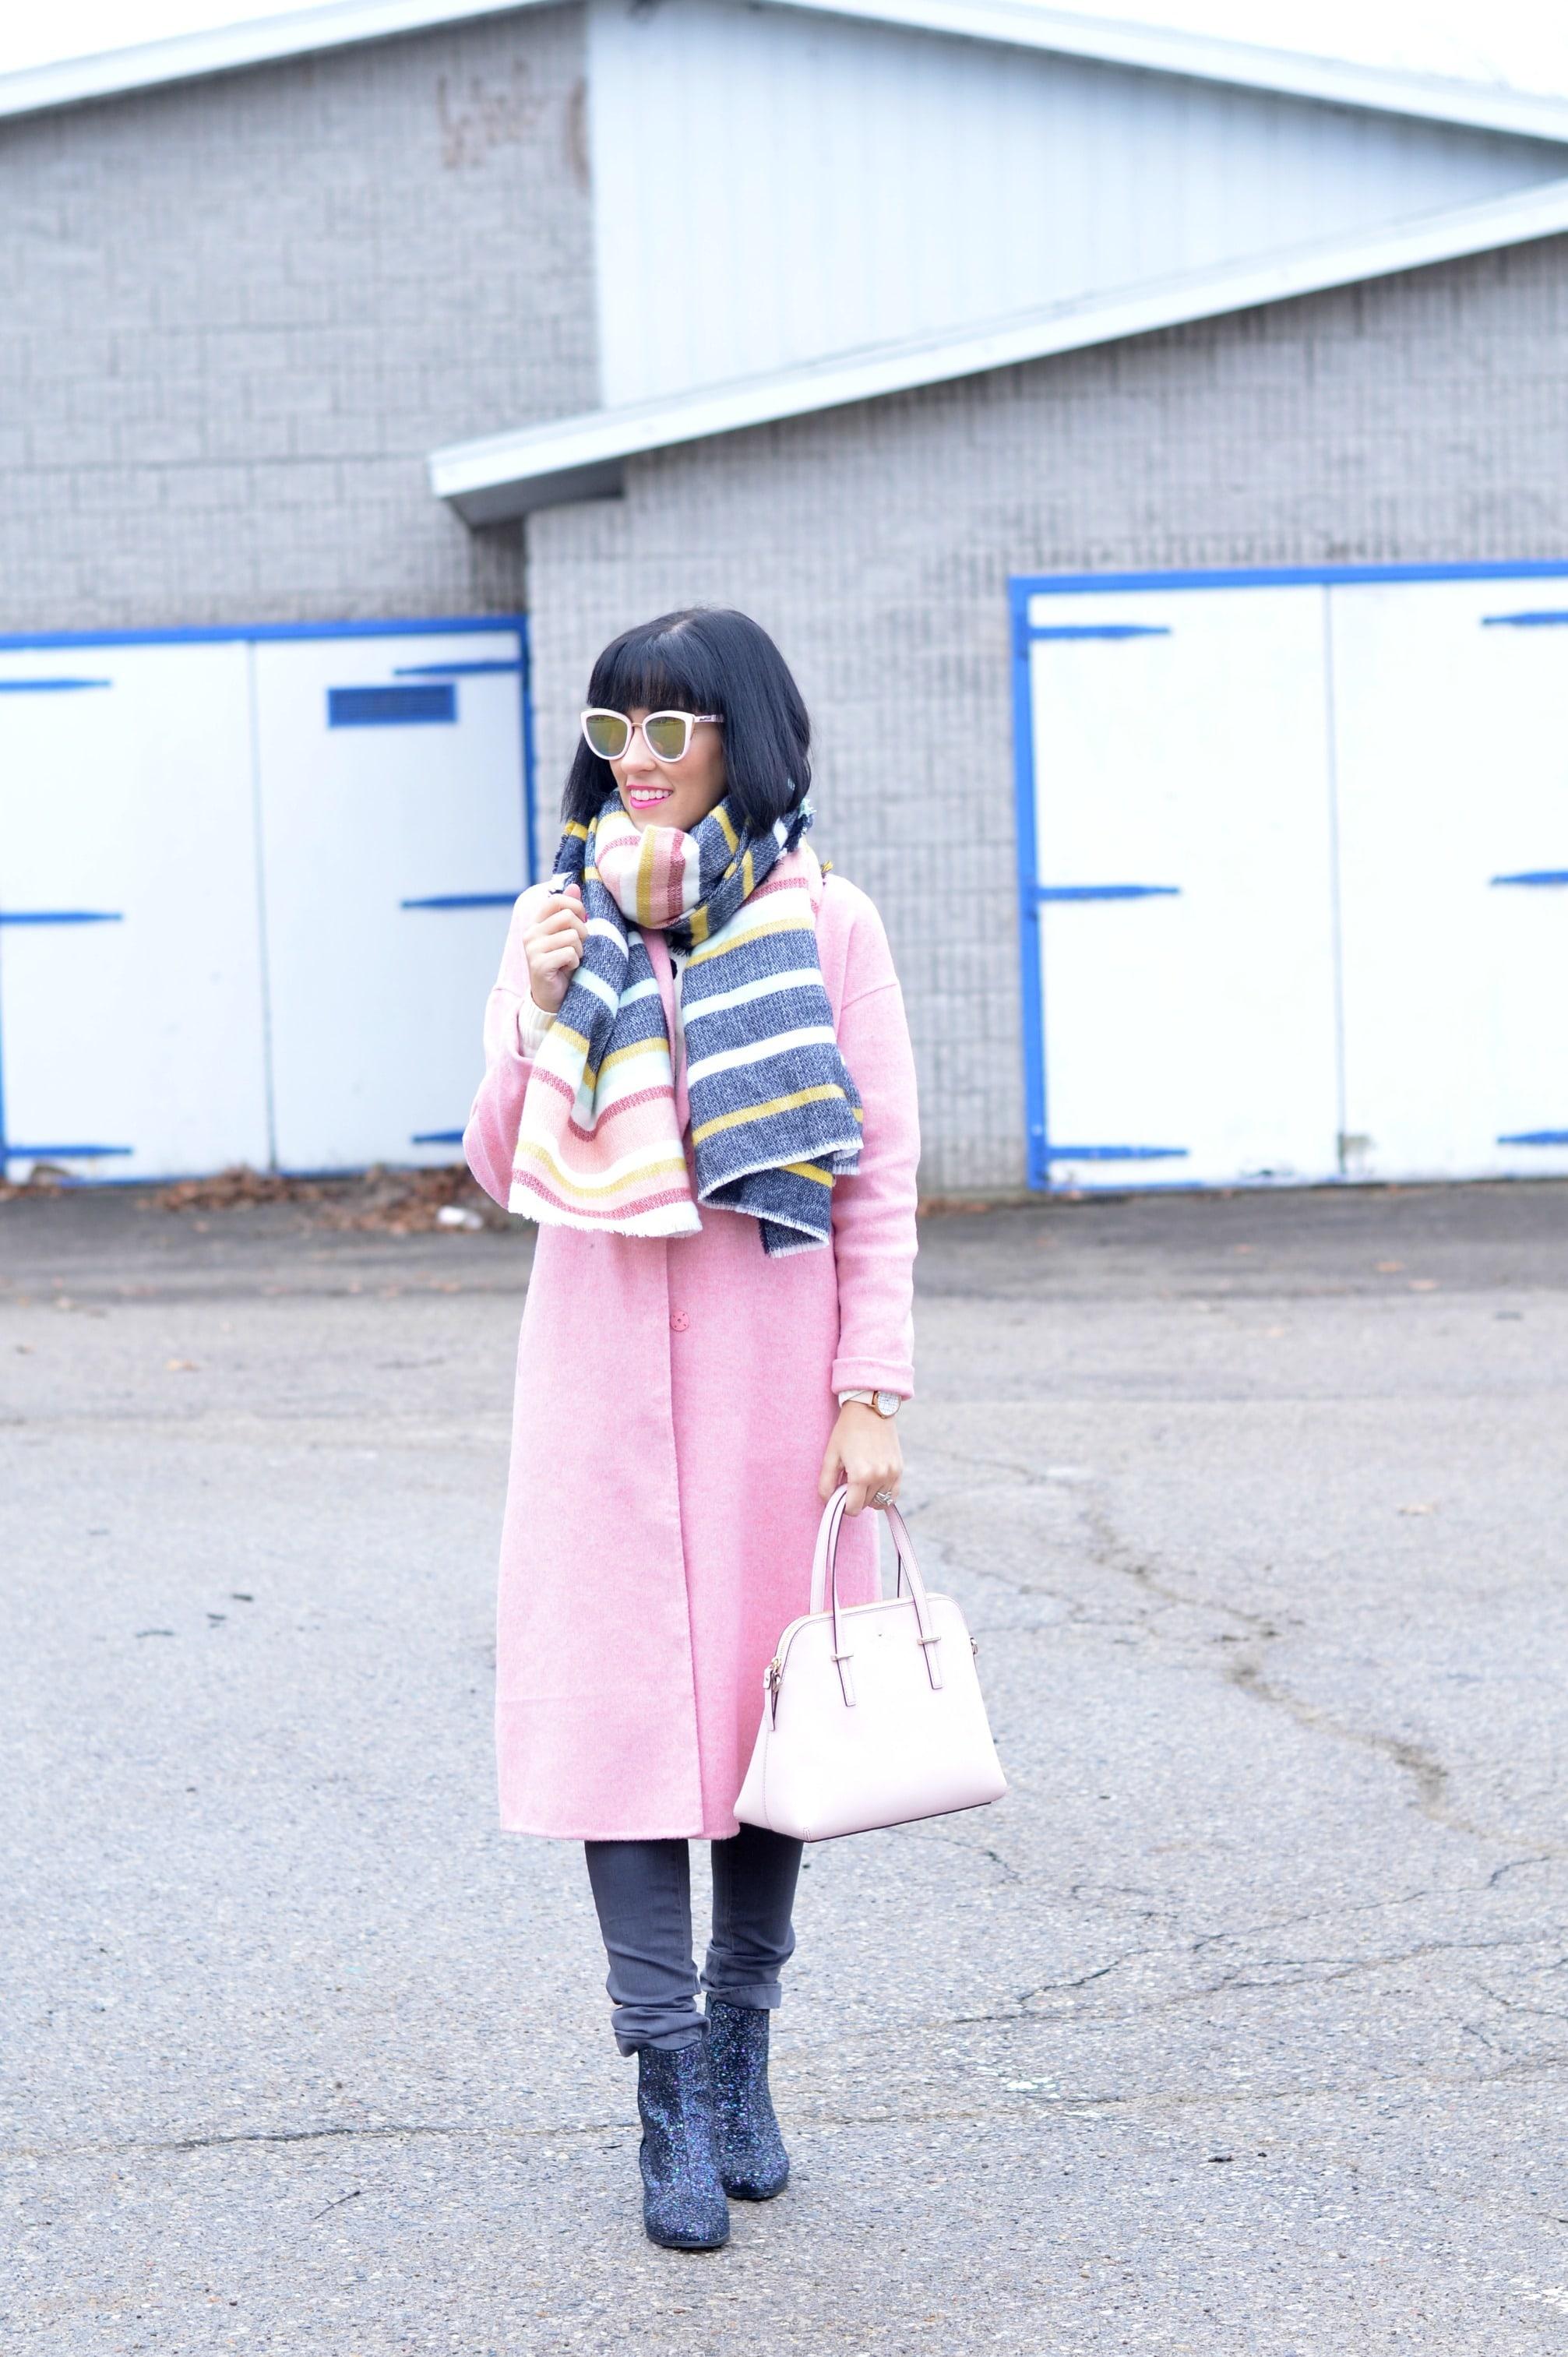 pink coat, pink jacket, pink winter coat, pink winter jacket, zara pink jacket, perfect winter coat, blog Toronto, blog Canada, fashion tips, fashion style, fashion bloggers Toronto